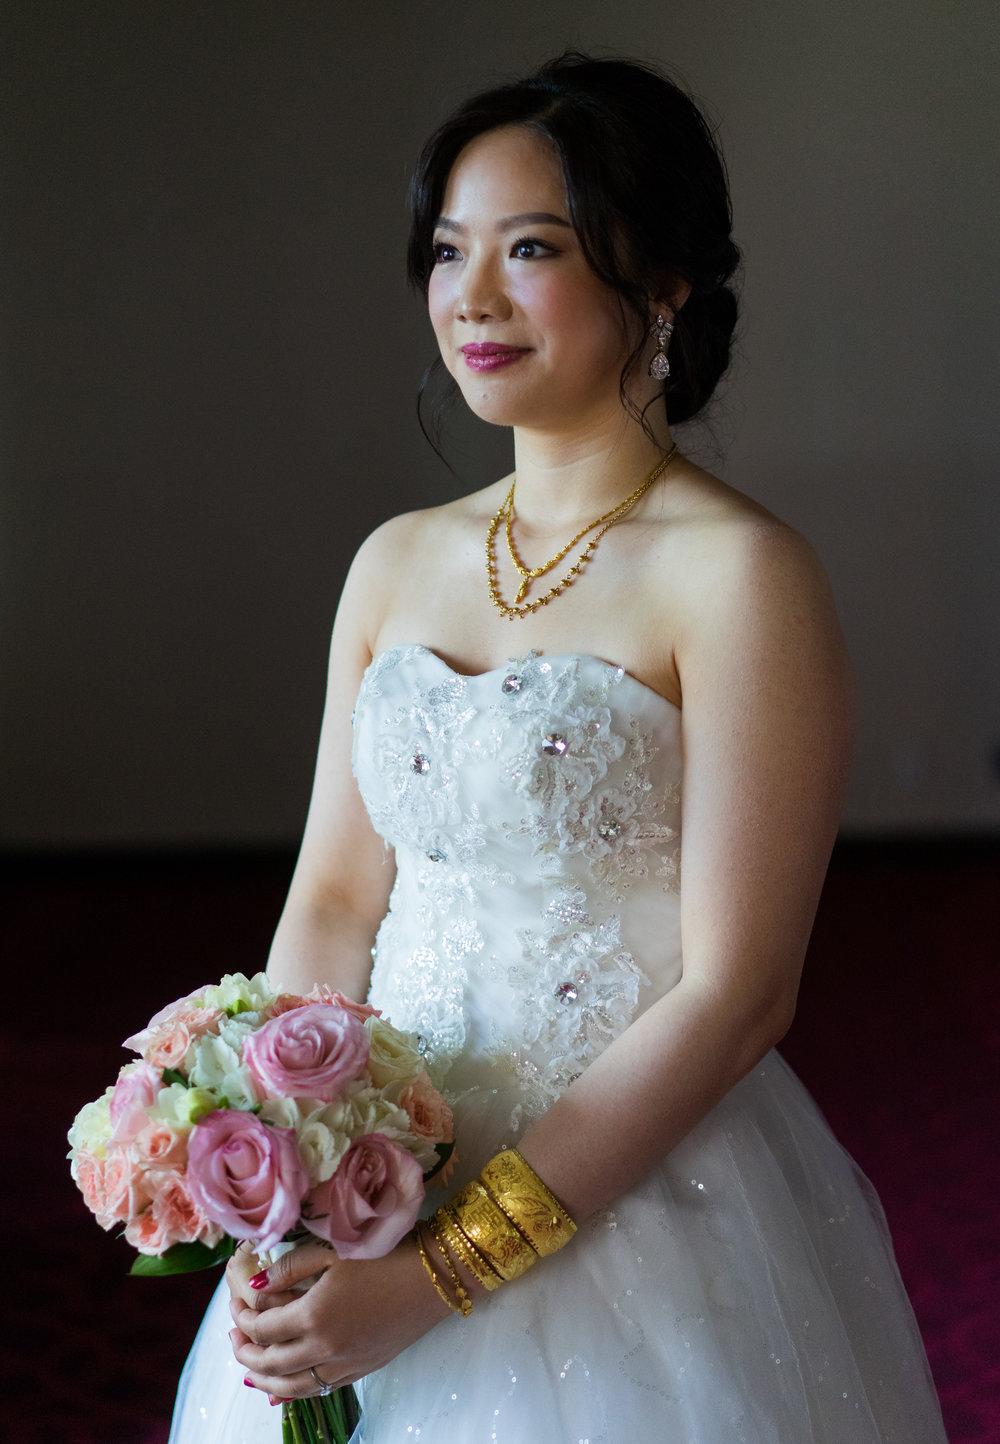 Yessica and Sam s Wedding-01 Getting Ready-0030.jpg